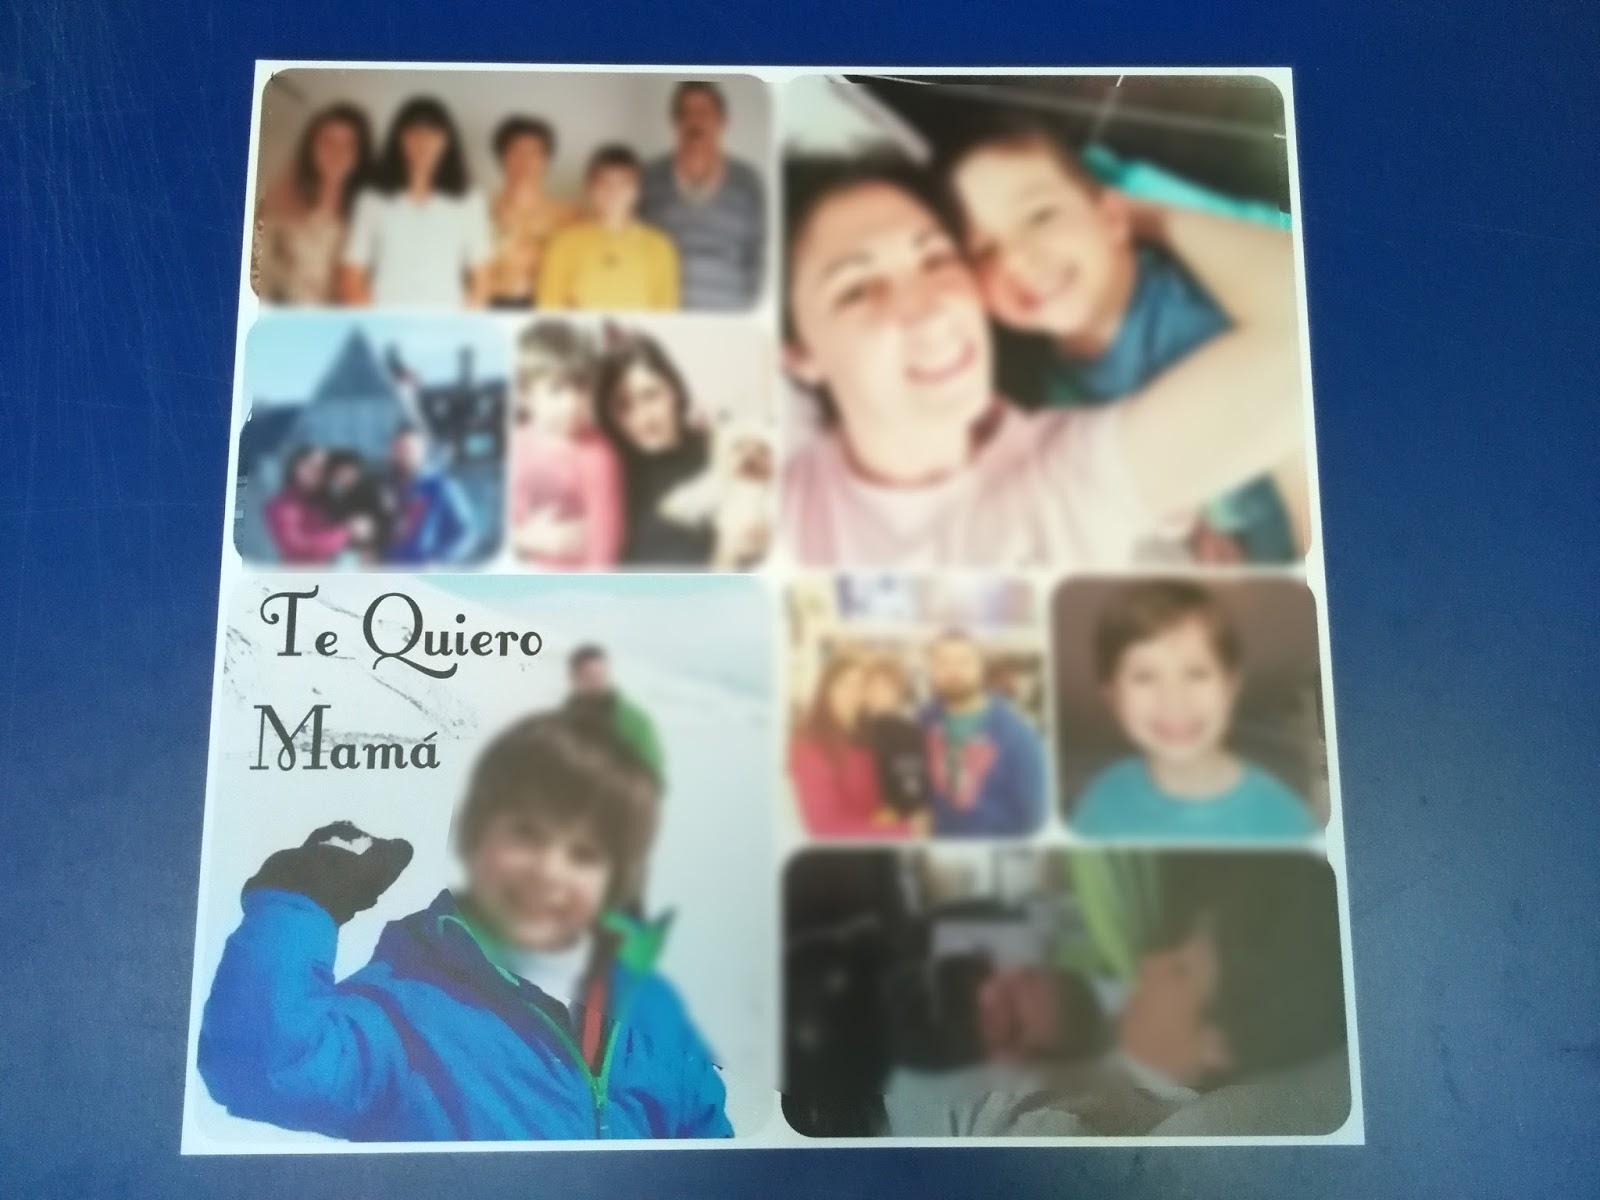 Fotocopias baratas cuadros panelados baratos - Cuadros online espana ...